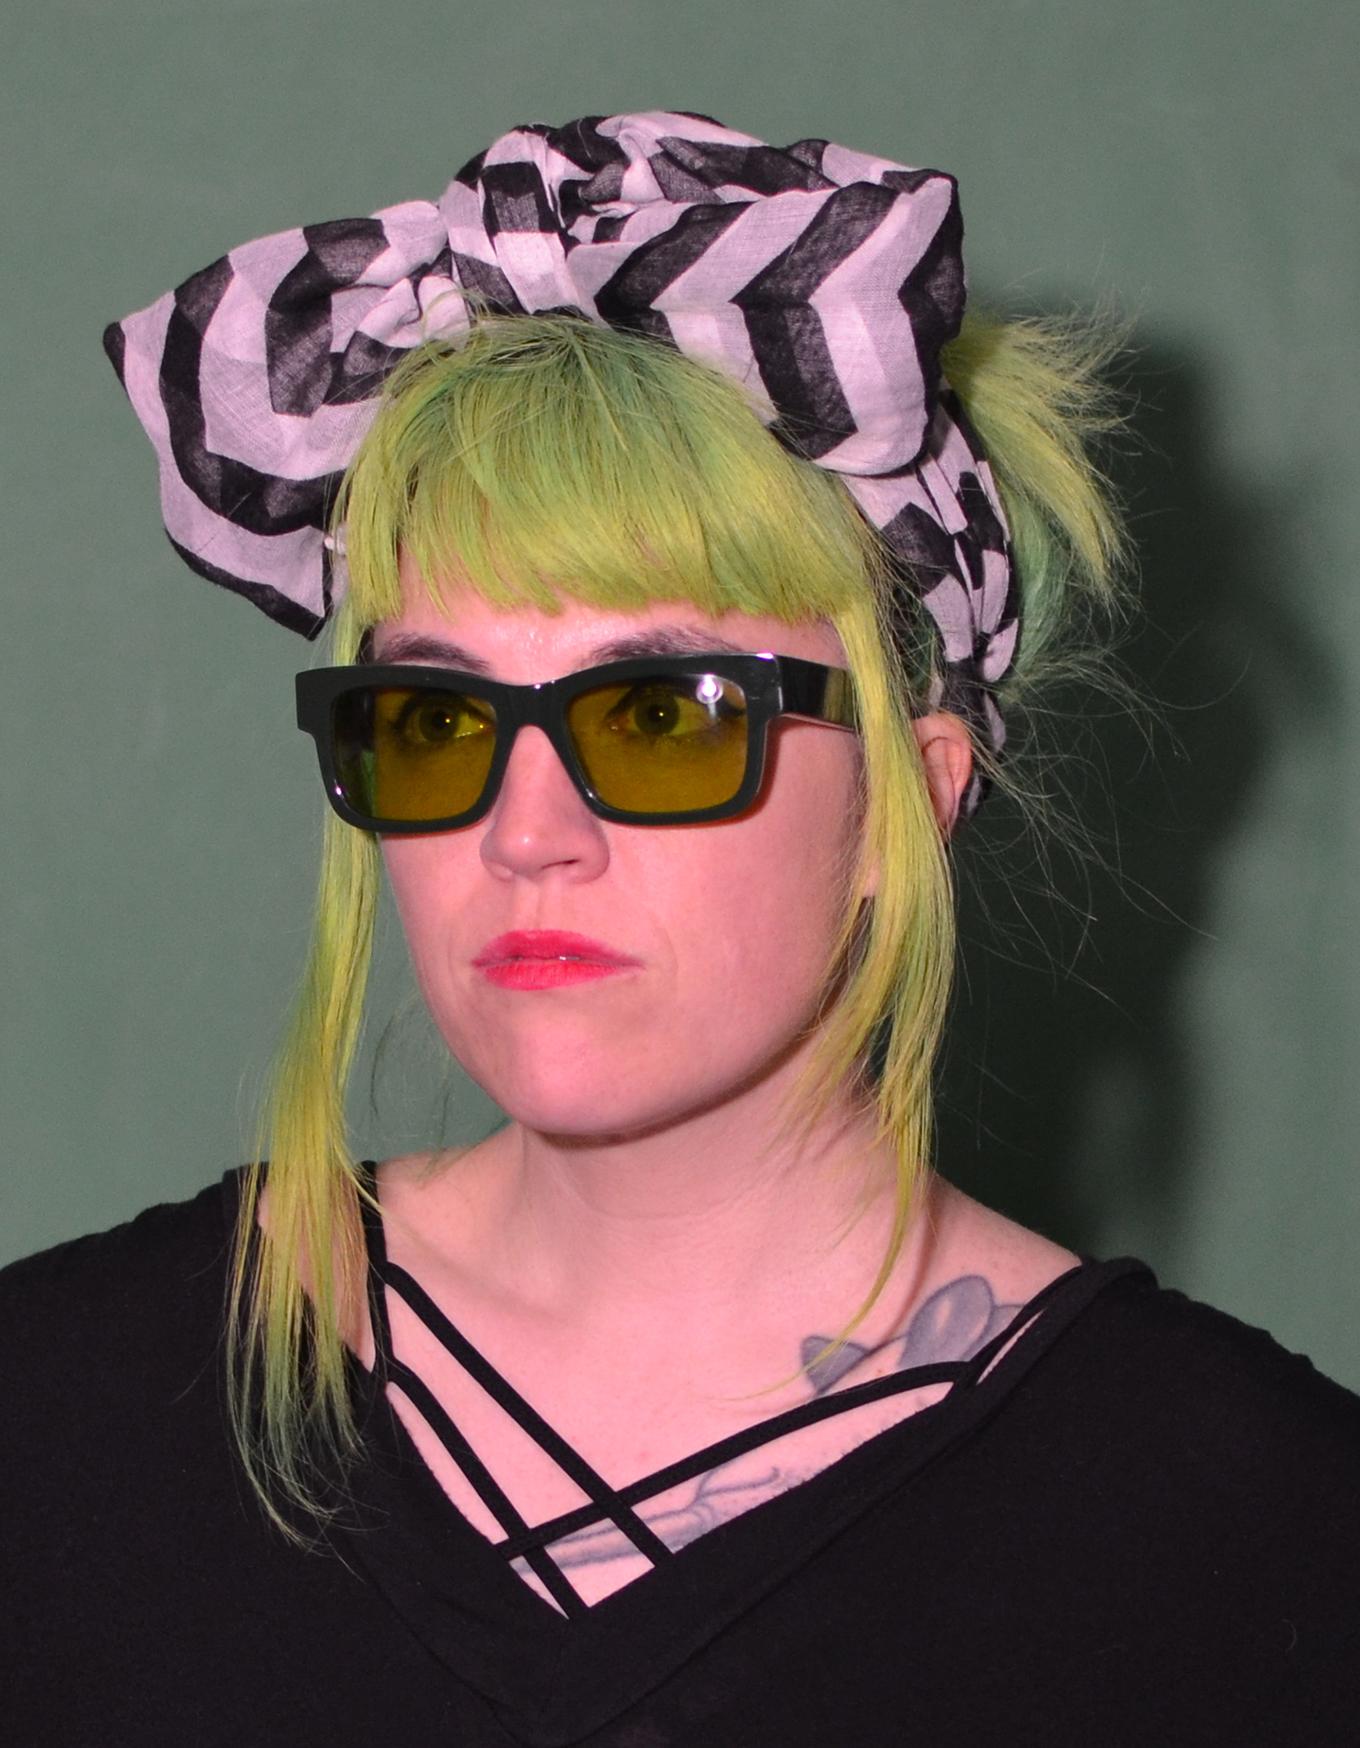 m-irpair-phantom-infrared-dot-matrix-mapping-sunglasses-eyewear.jpg